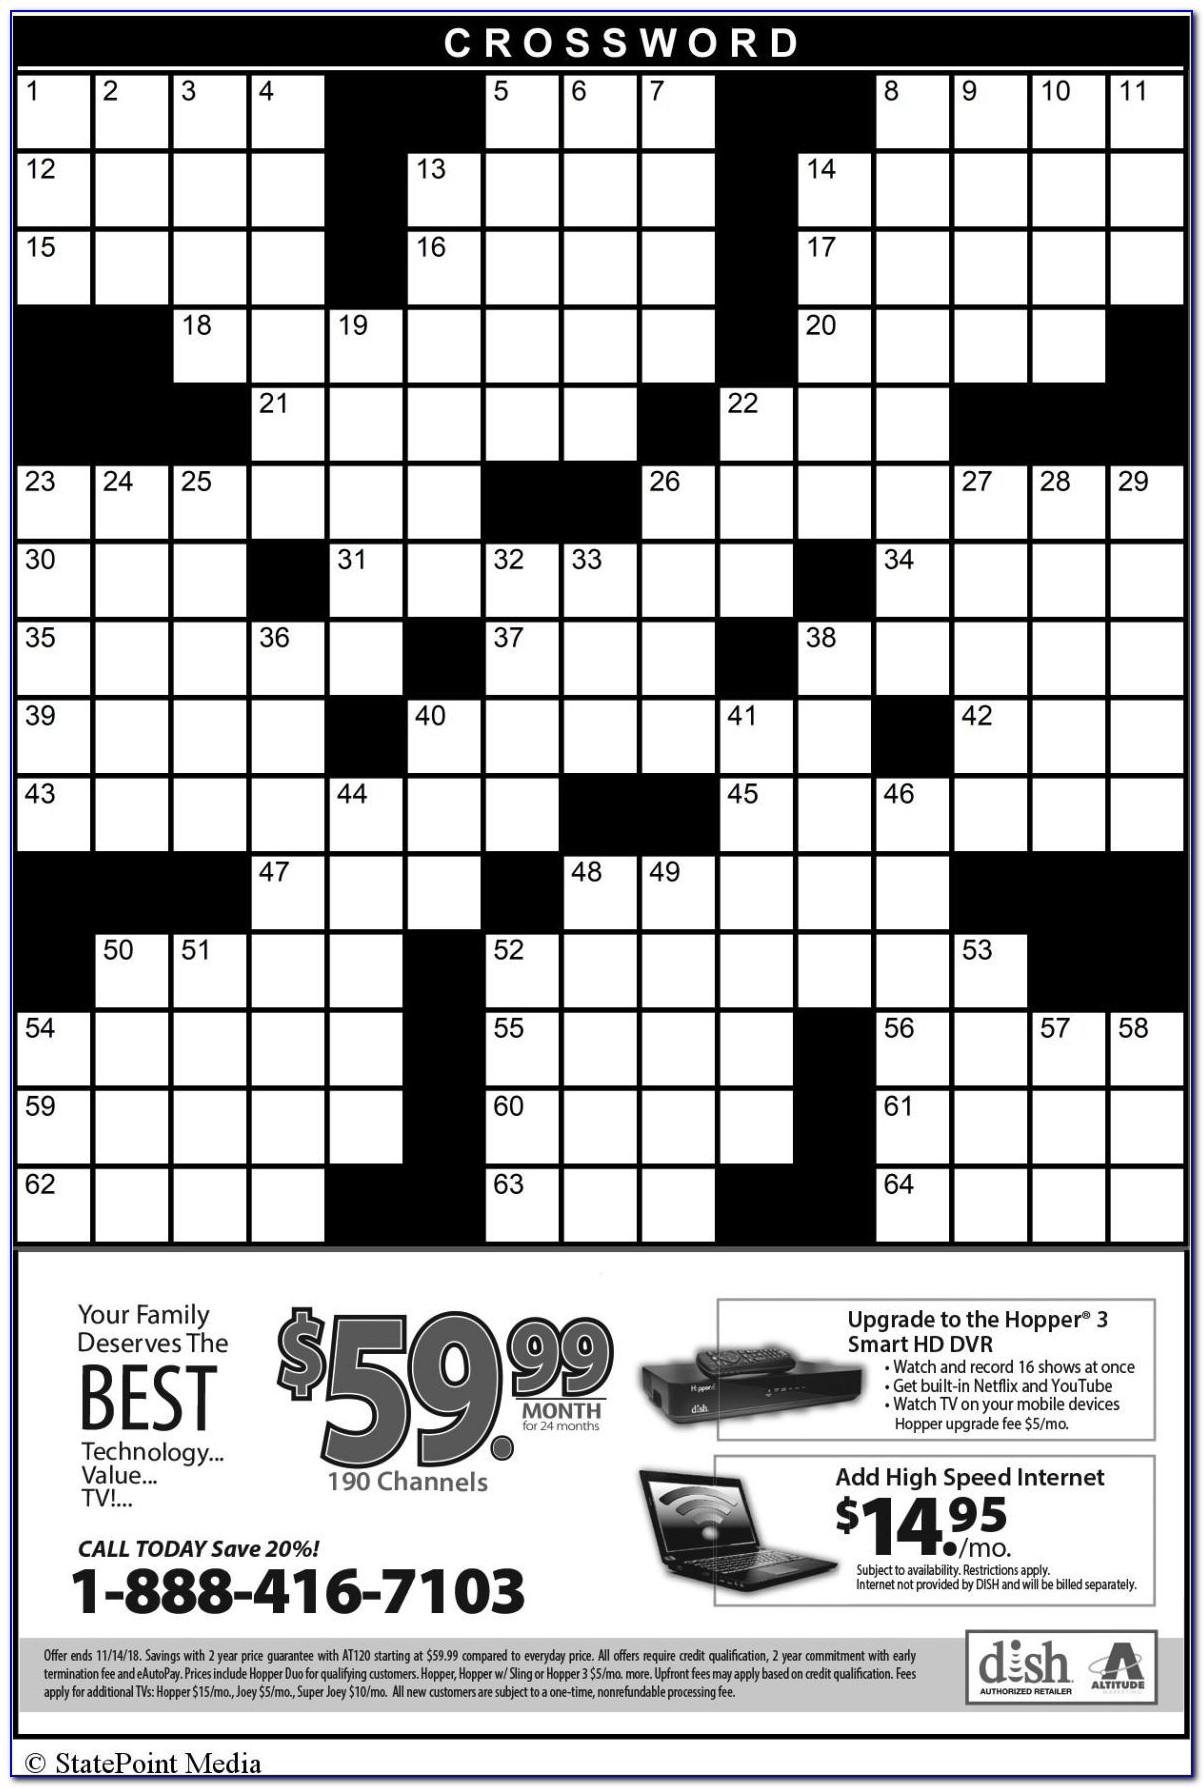 Marriage Announcement Crossword Clue 5 Letters